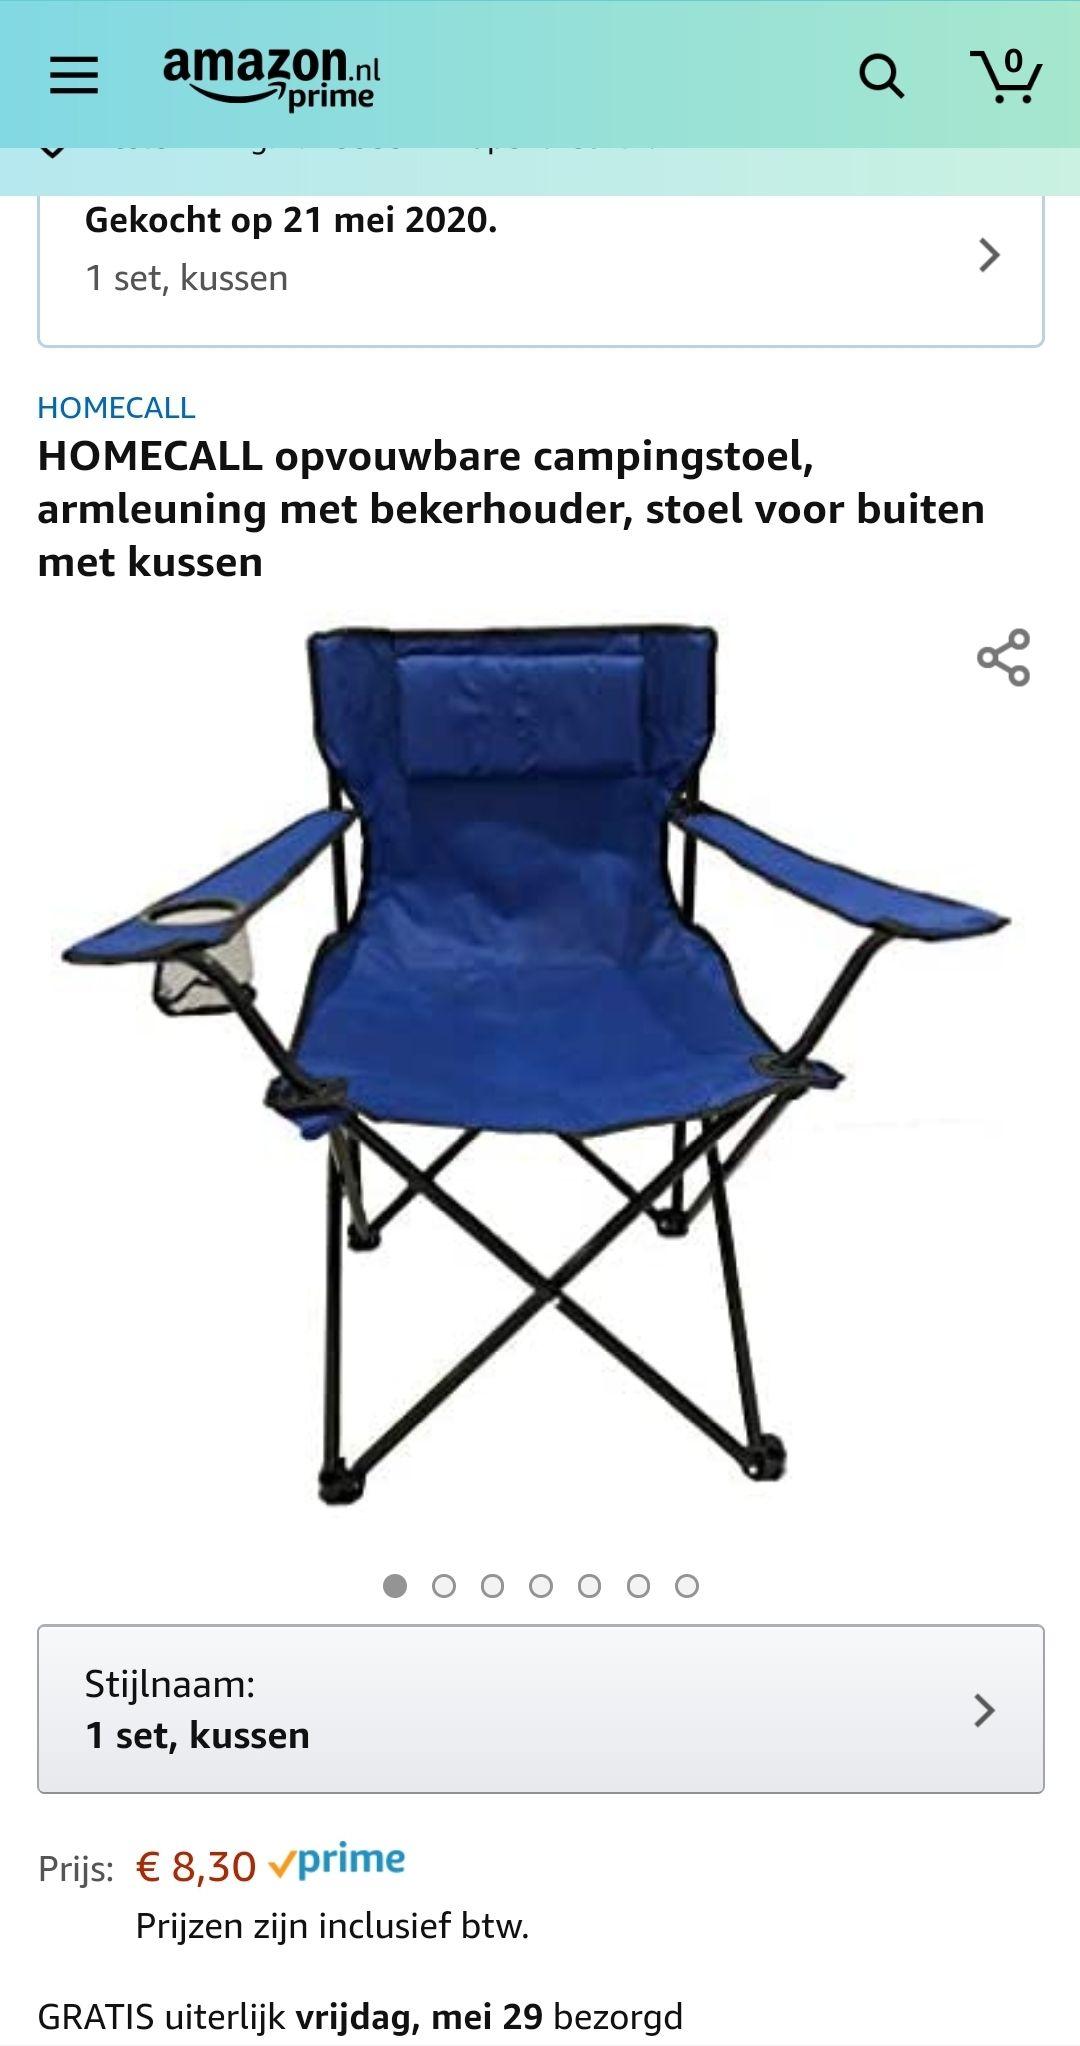 Opvouwbare campingstoel €7,56 @ Amazon.nl